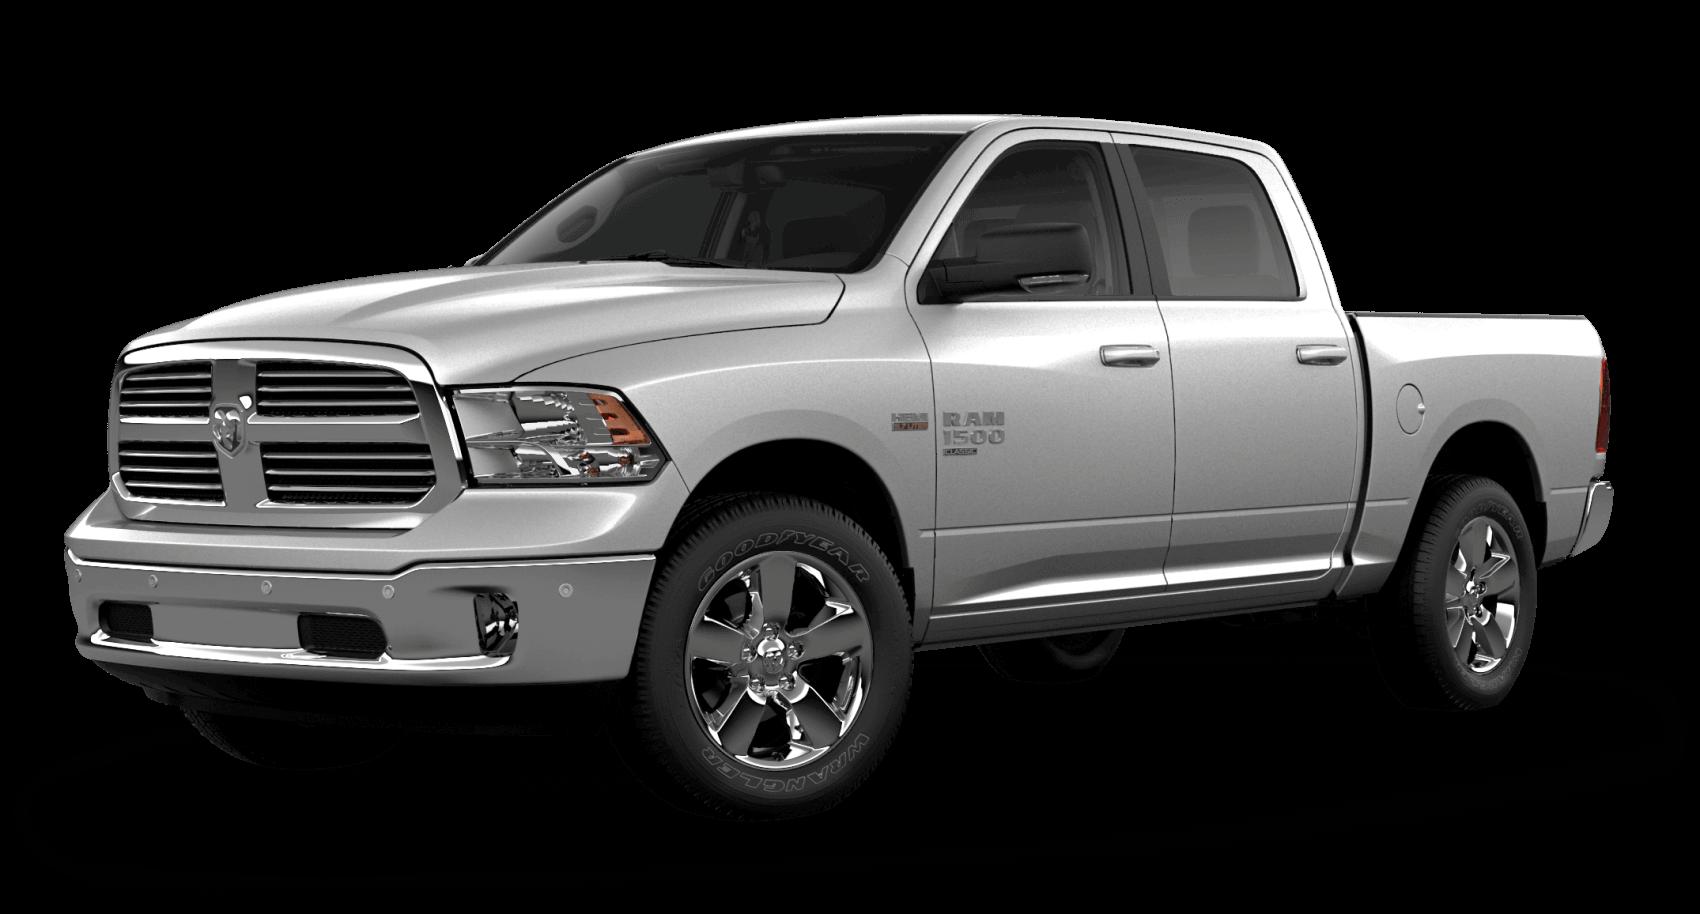 2021 Ram 1500 Silver Wilsonville CDJR